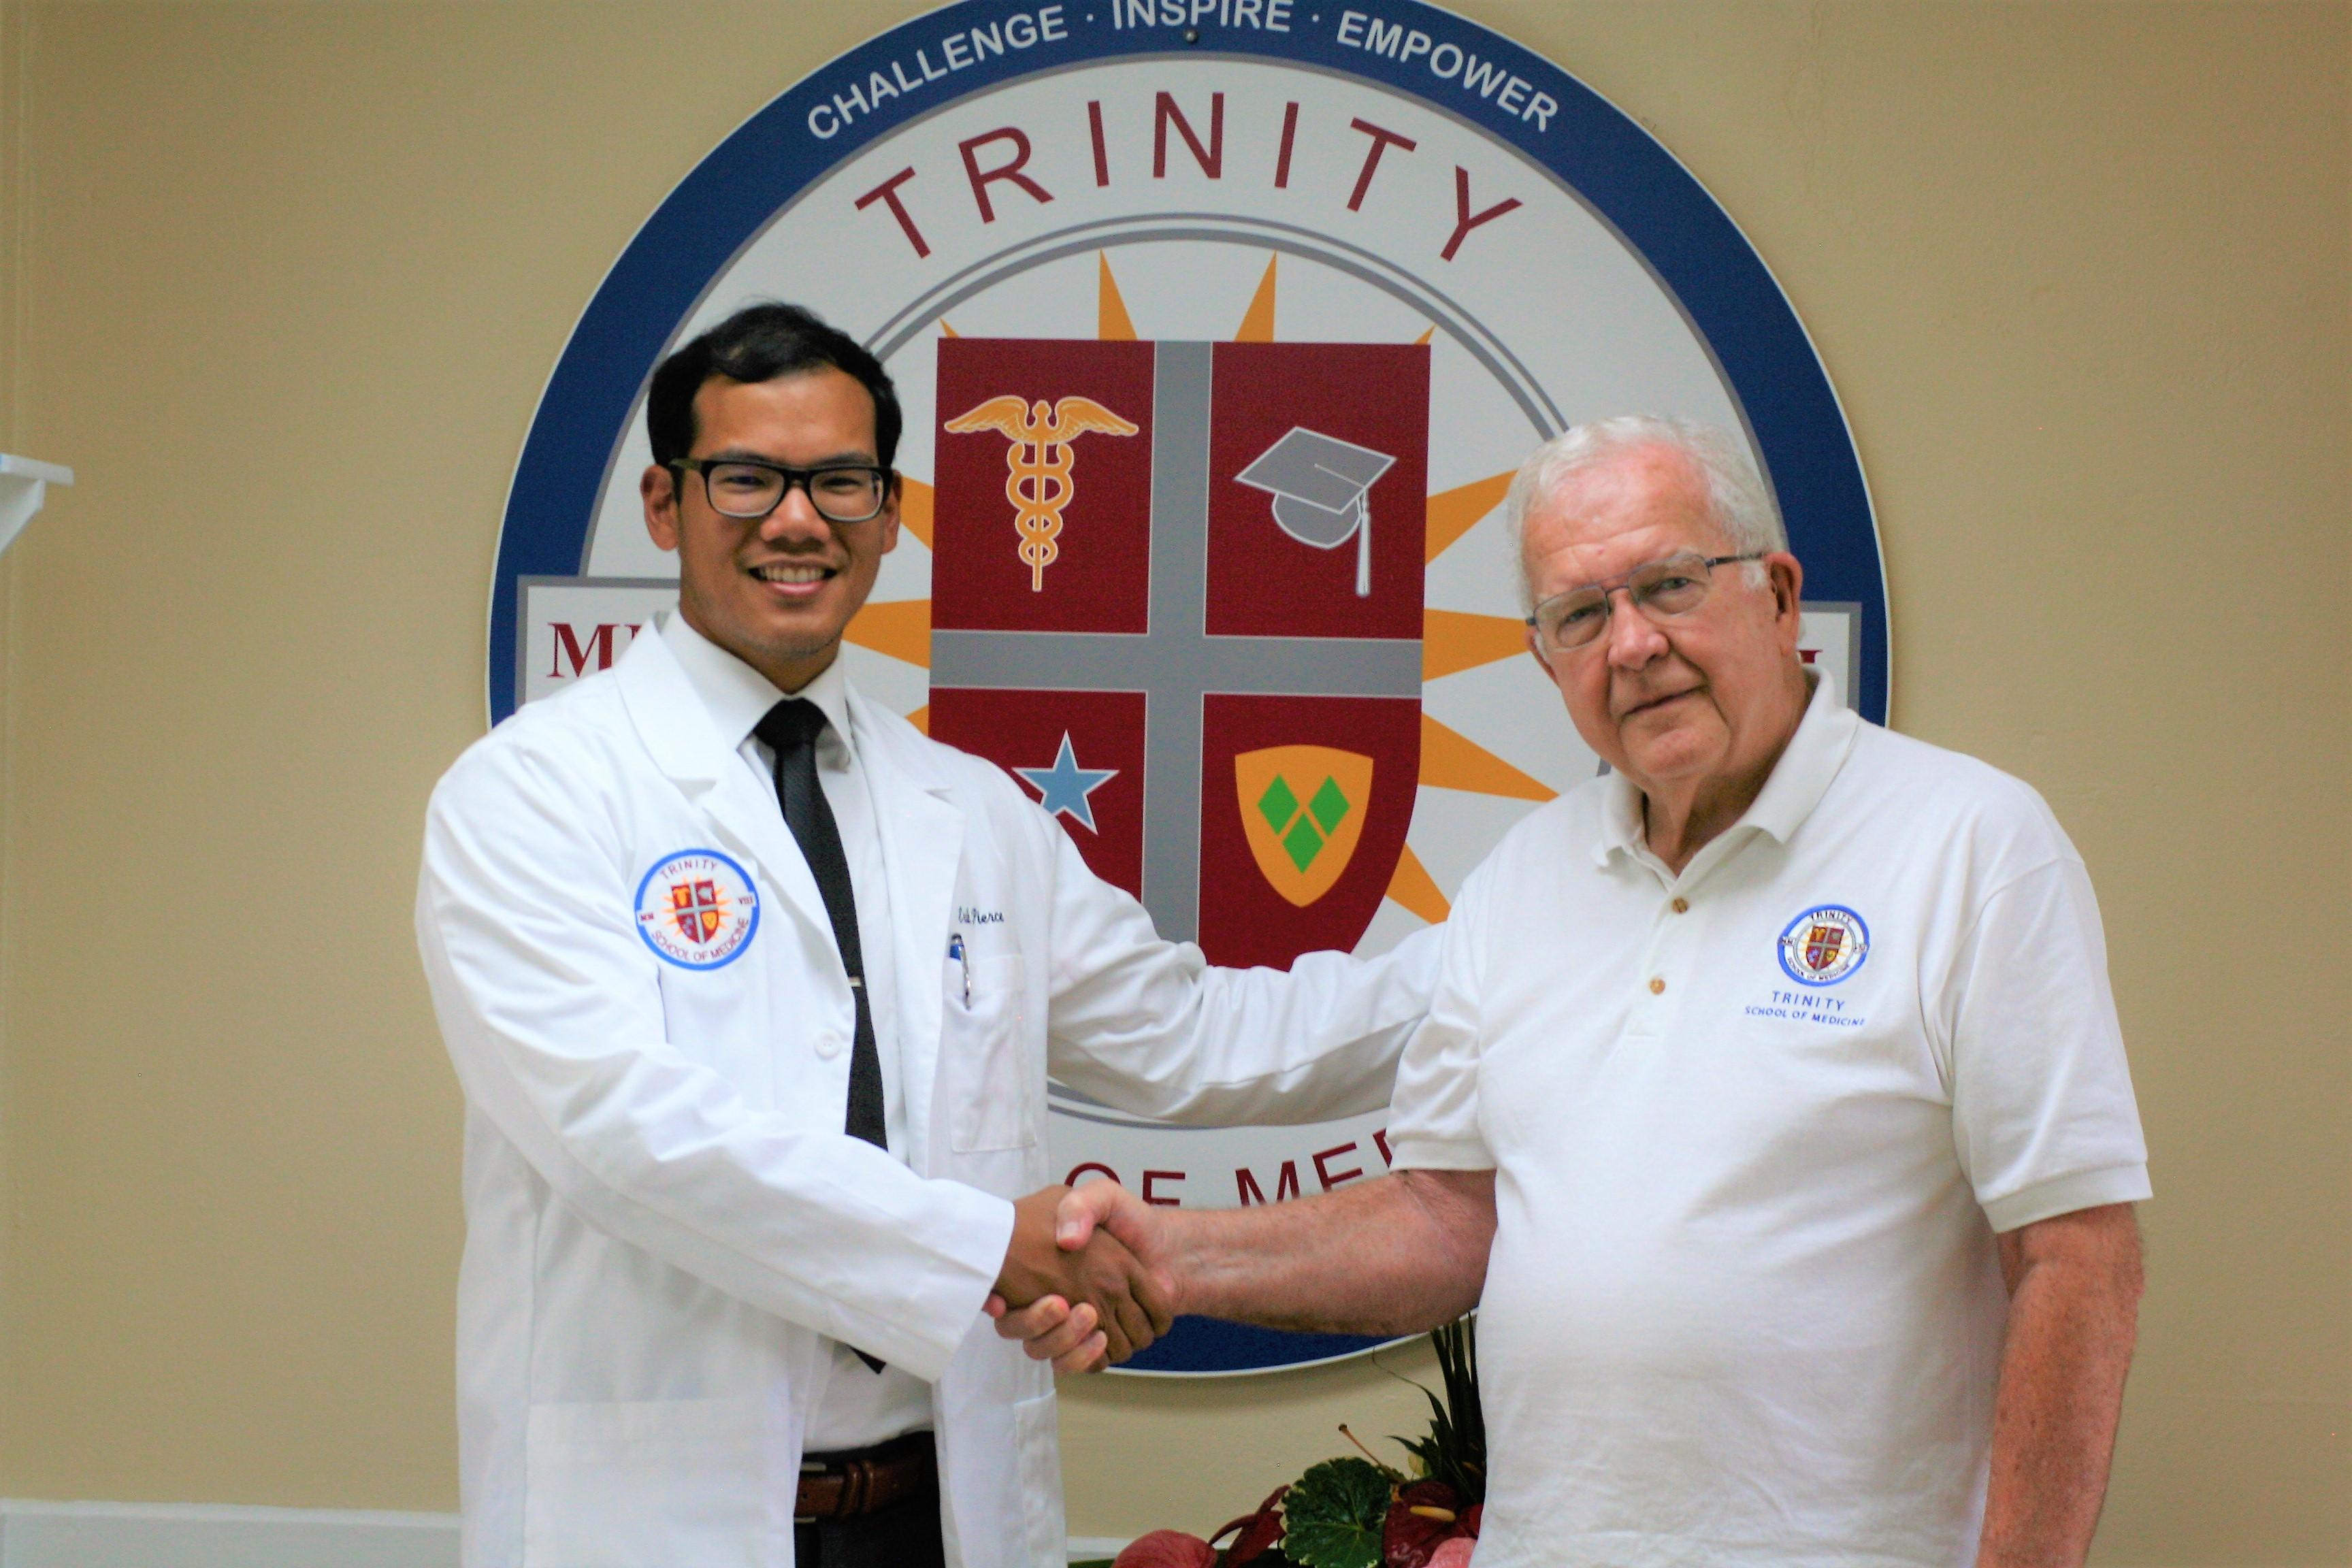 Trinity School of Medicine Announces September 2017 Chancellor's Scholarship Recipient